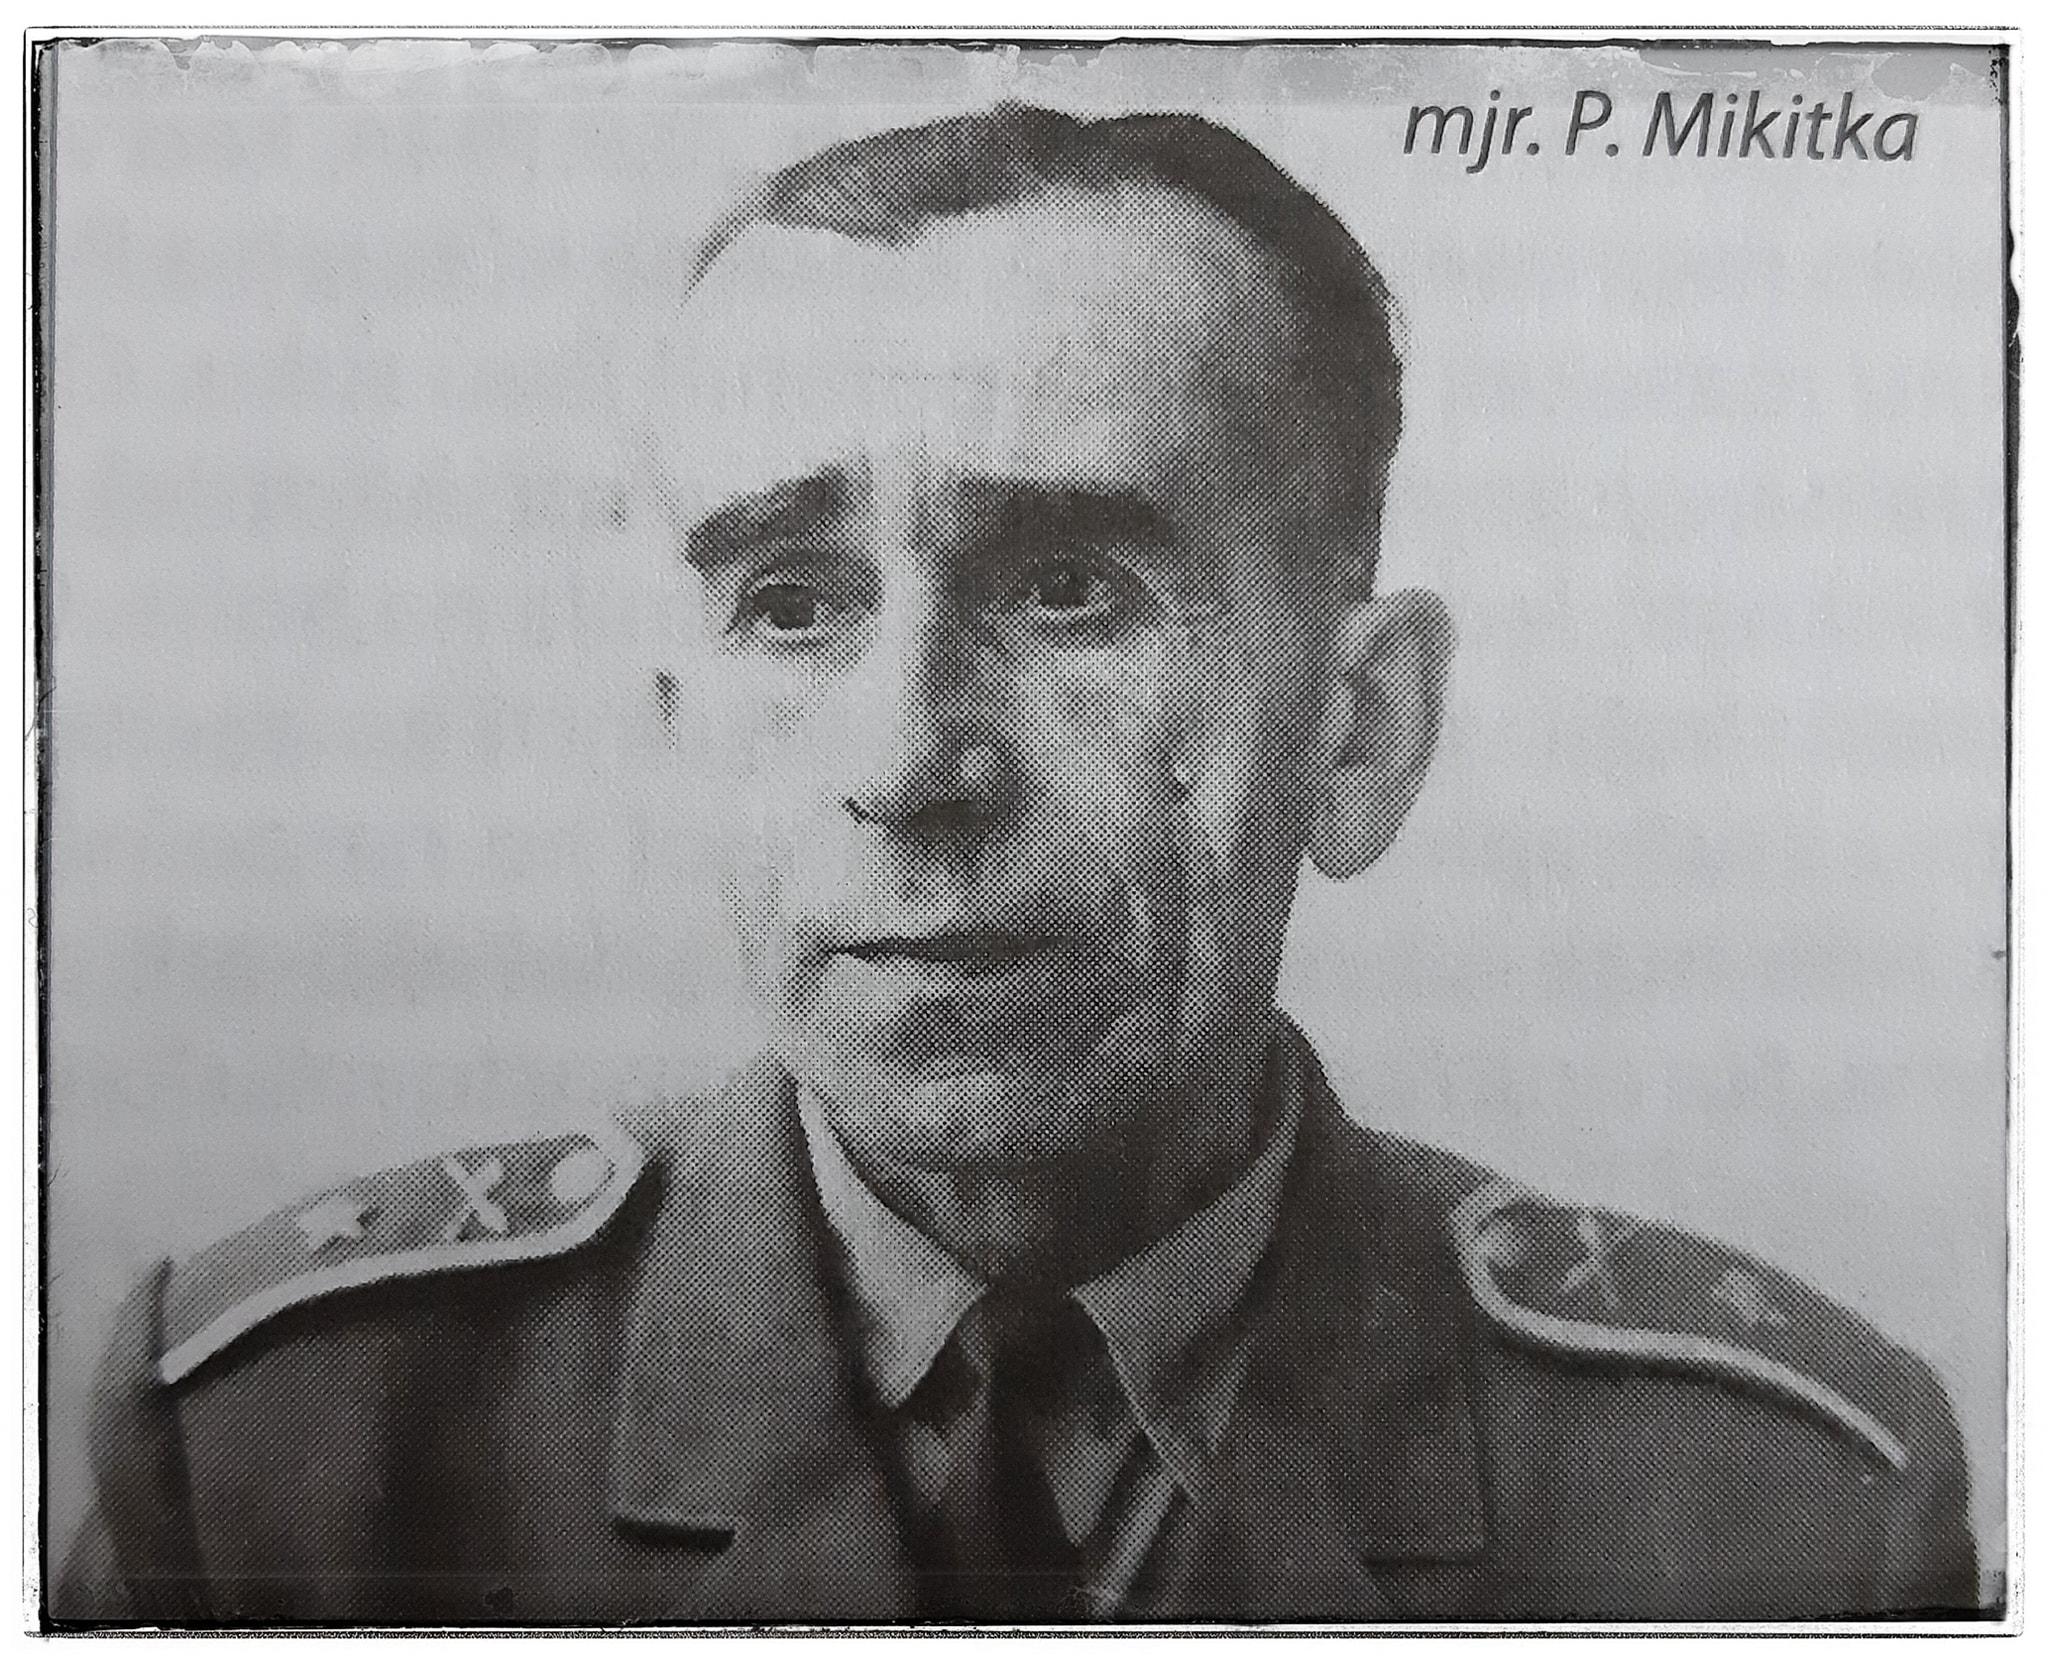 Peter Mikitka